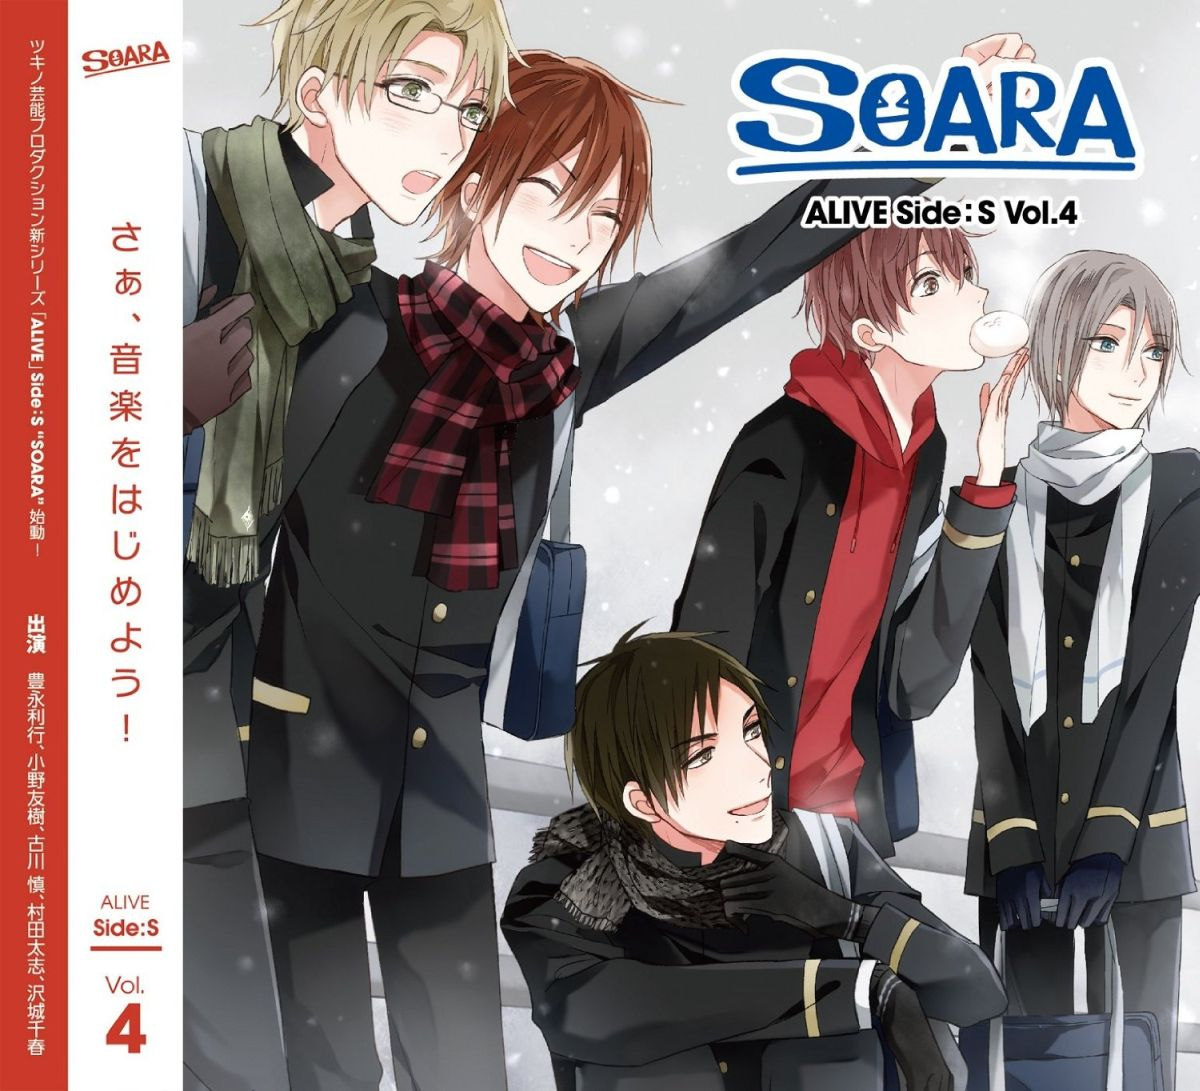 alive soara dramacd vol 4